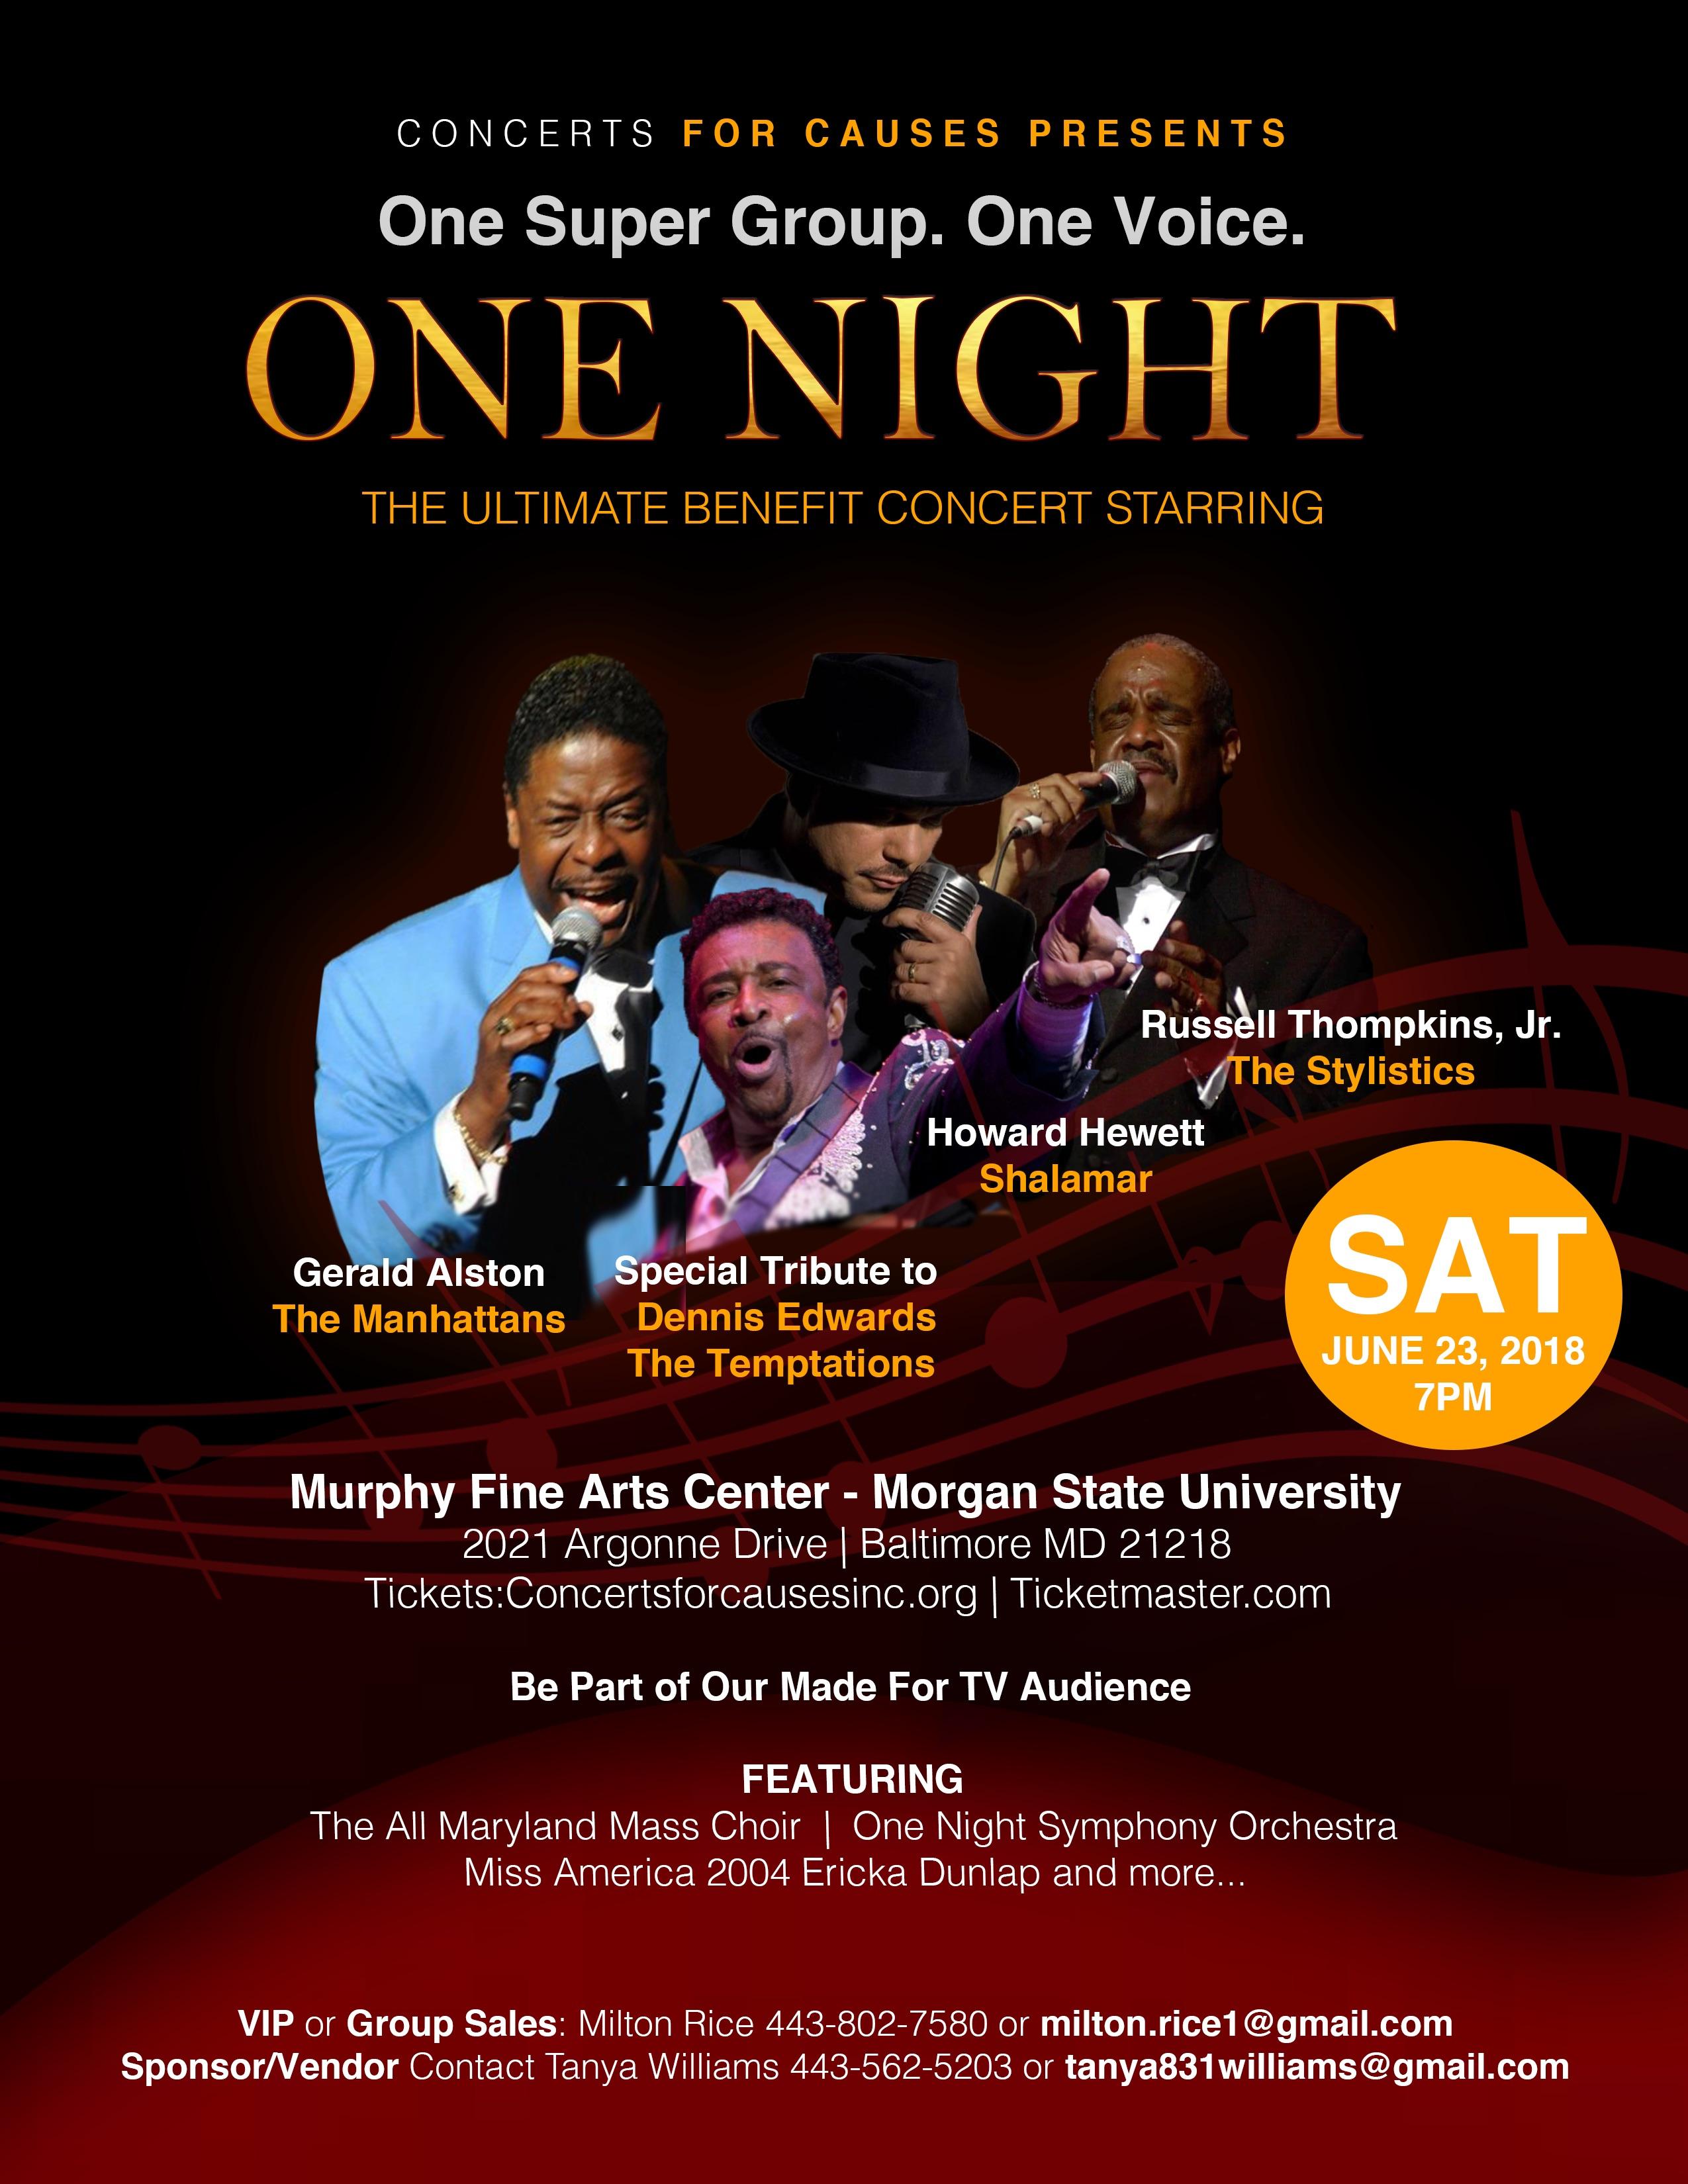 One Night flyer